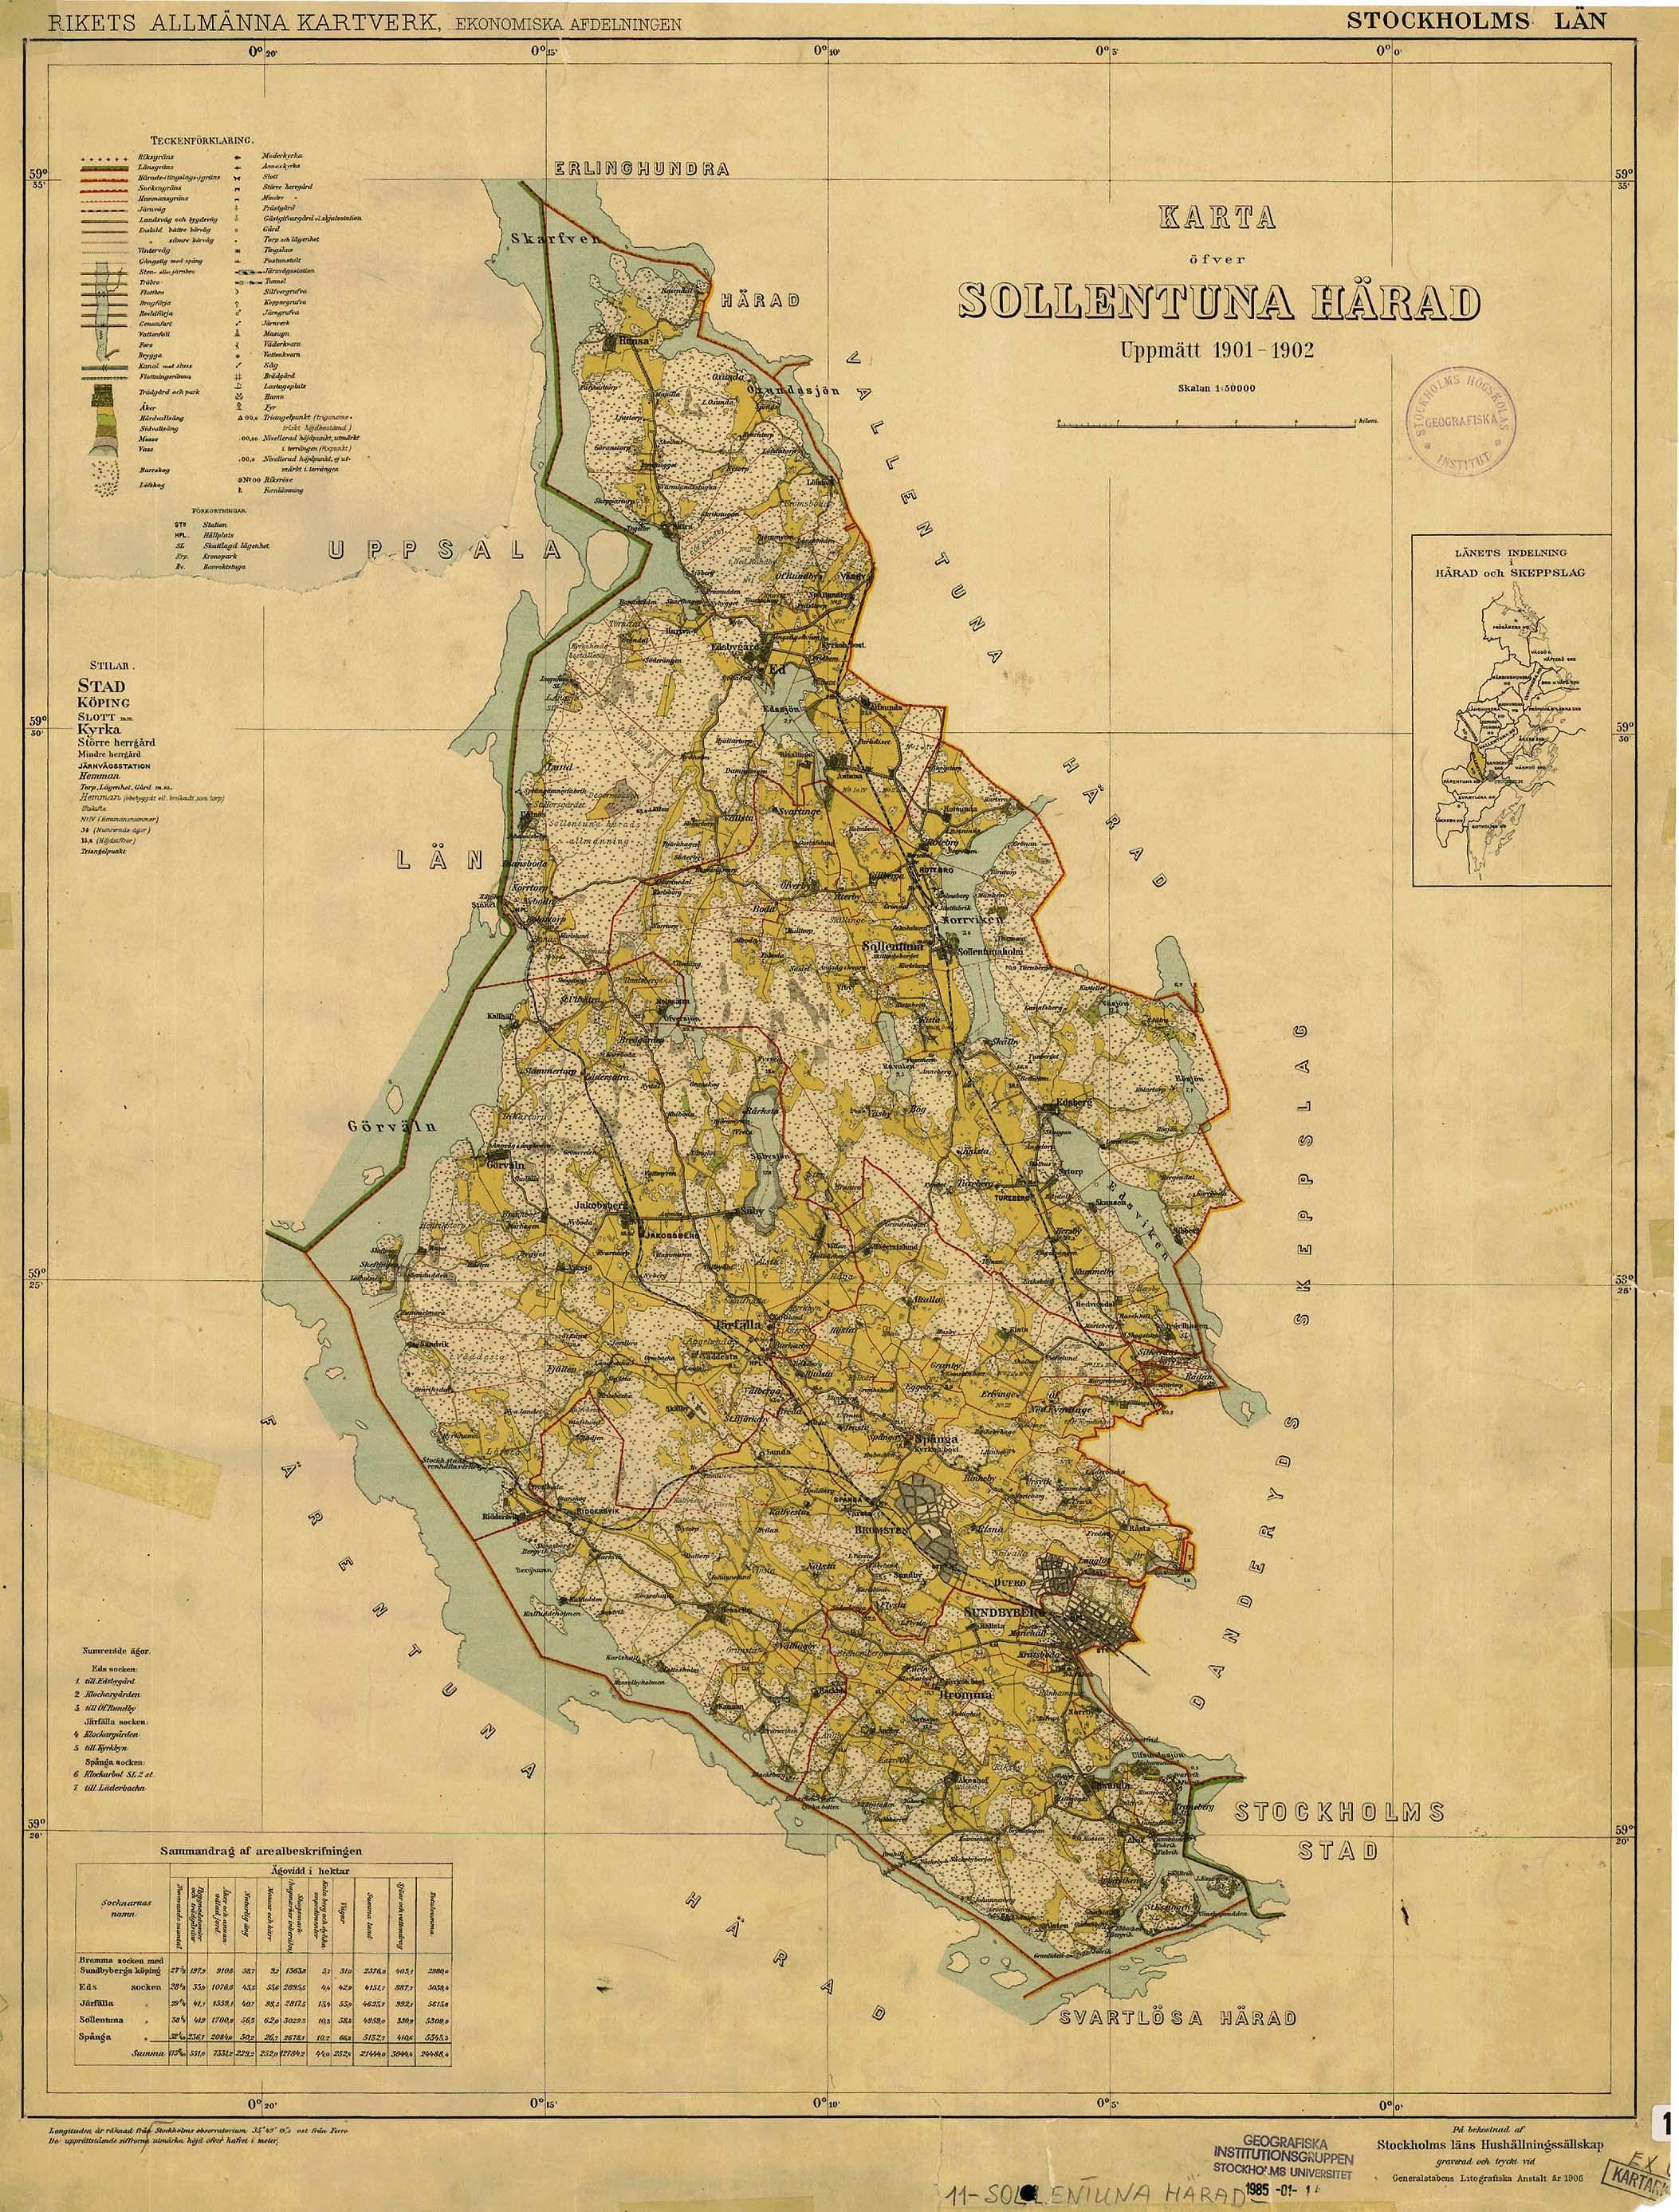 File Sollentuna Harad 1901 Karta Jpg Wikimedia Commons